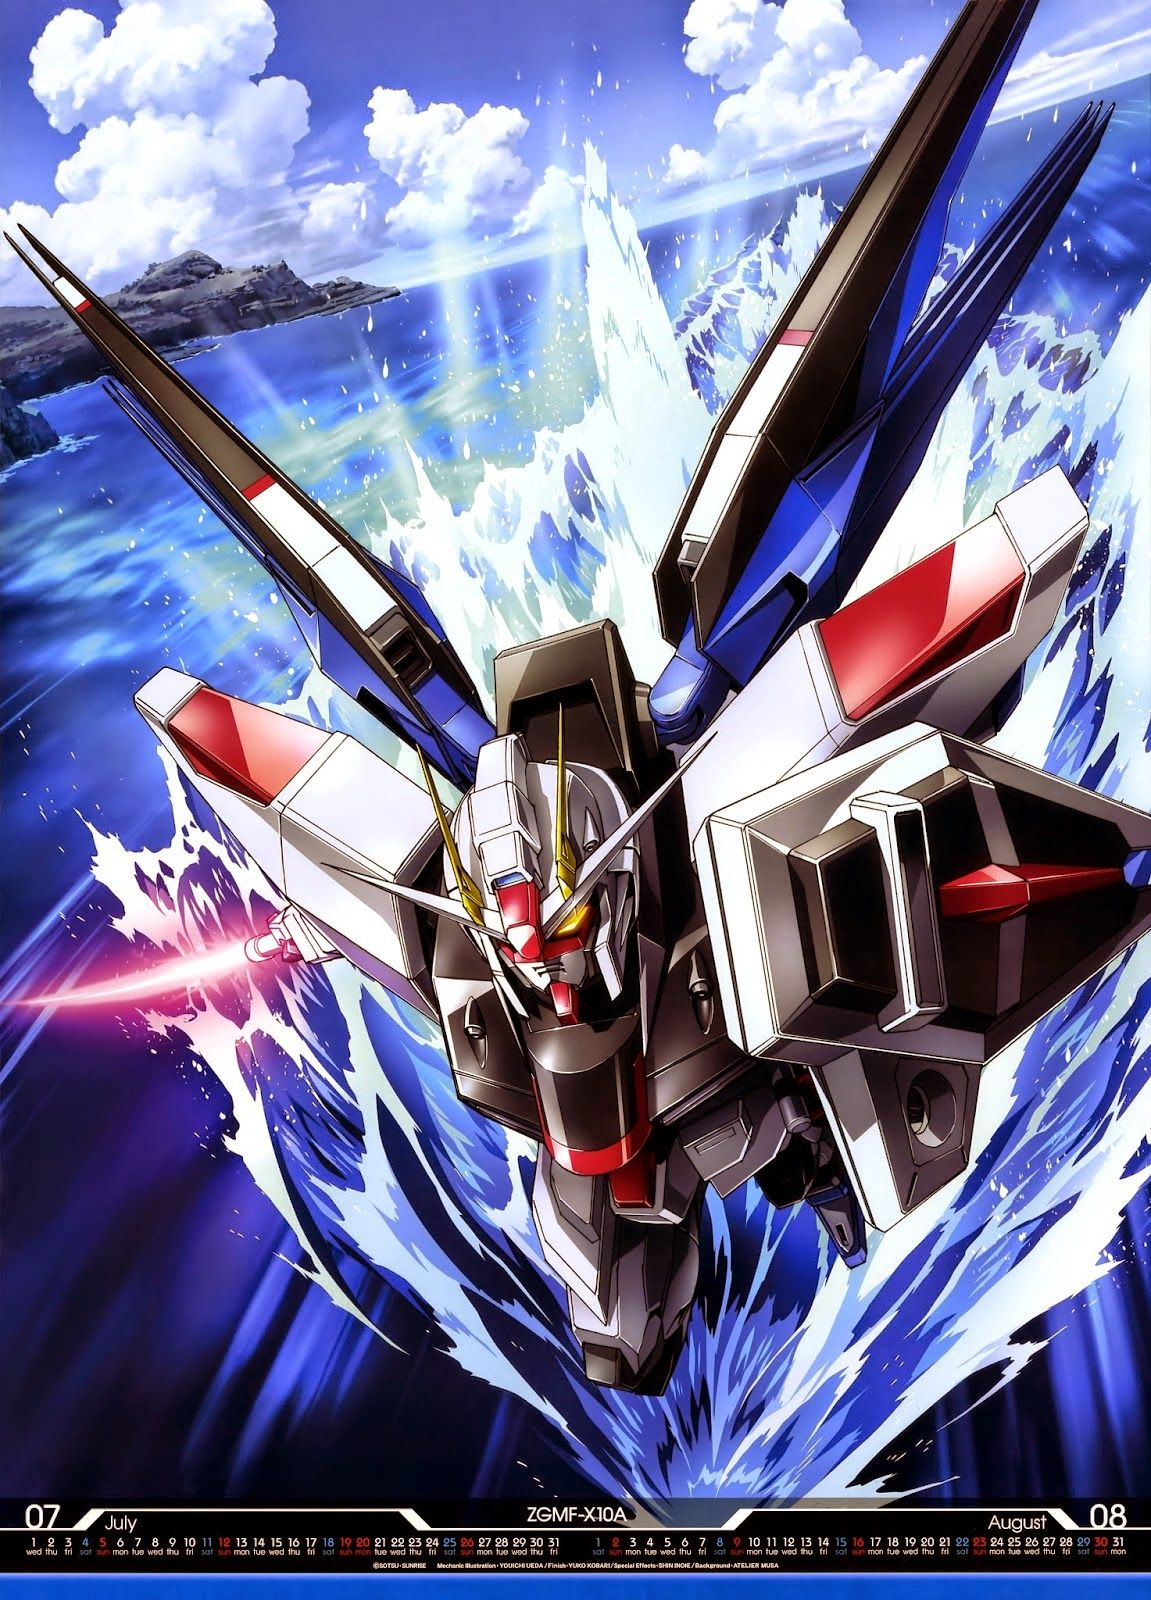 GUNDAM GUY: Mobile Suit Gundam 2015 Calender - Image Gallery